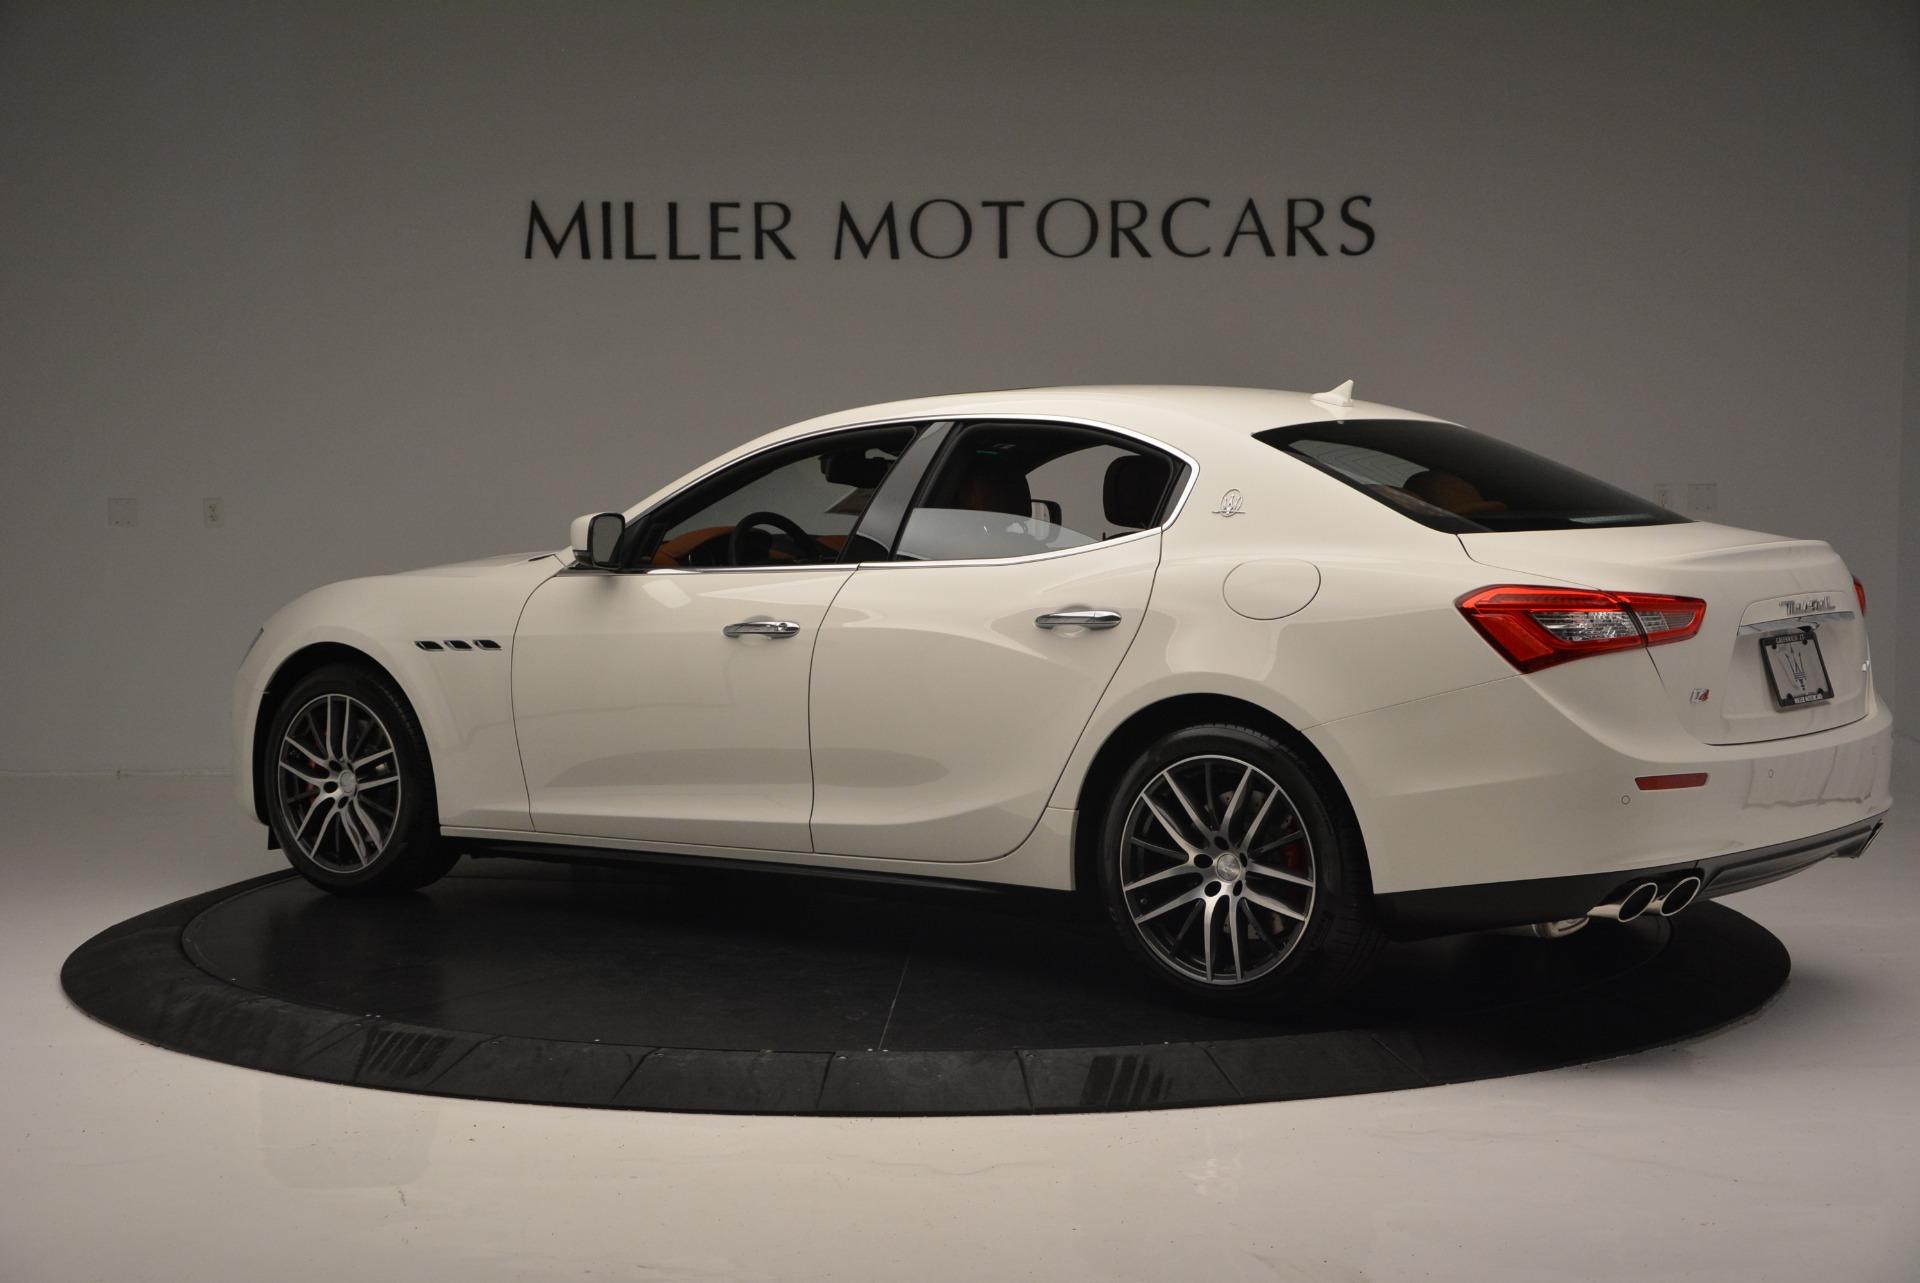 Used 2017 Maserati Ghibli S Q4 Ex-Loaner For Sale In Greenwich, CT 719_p4